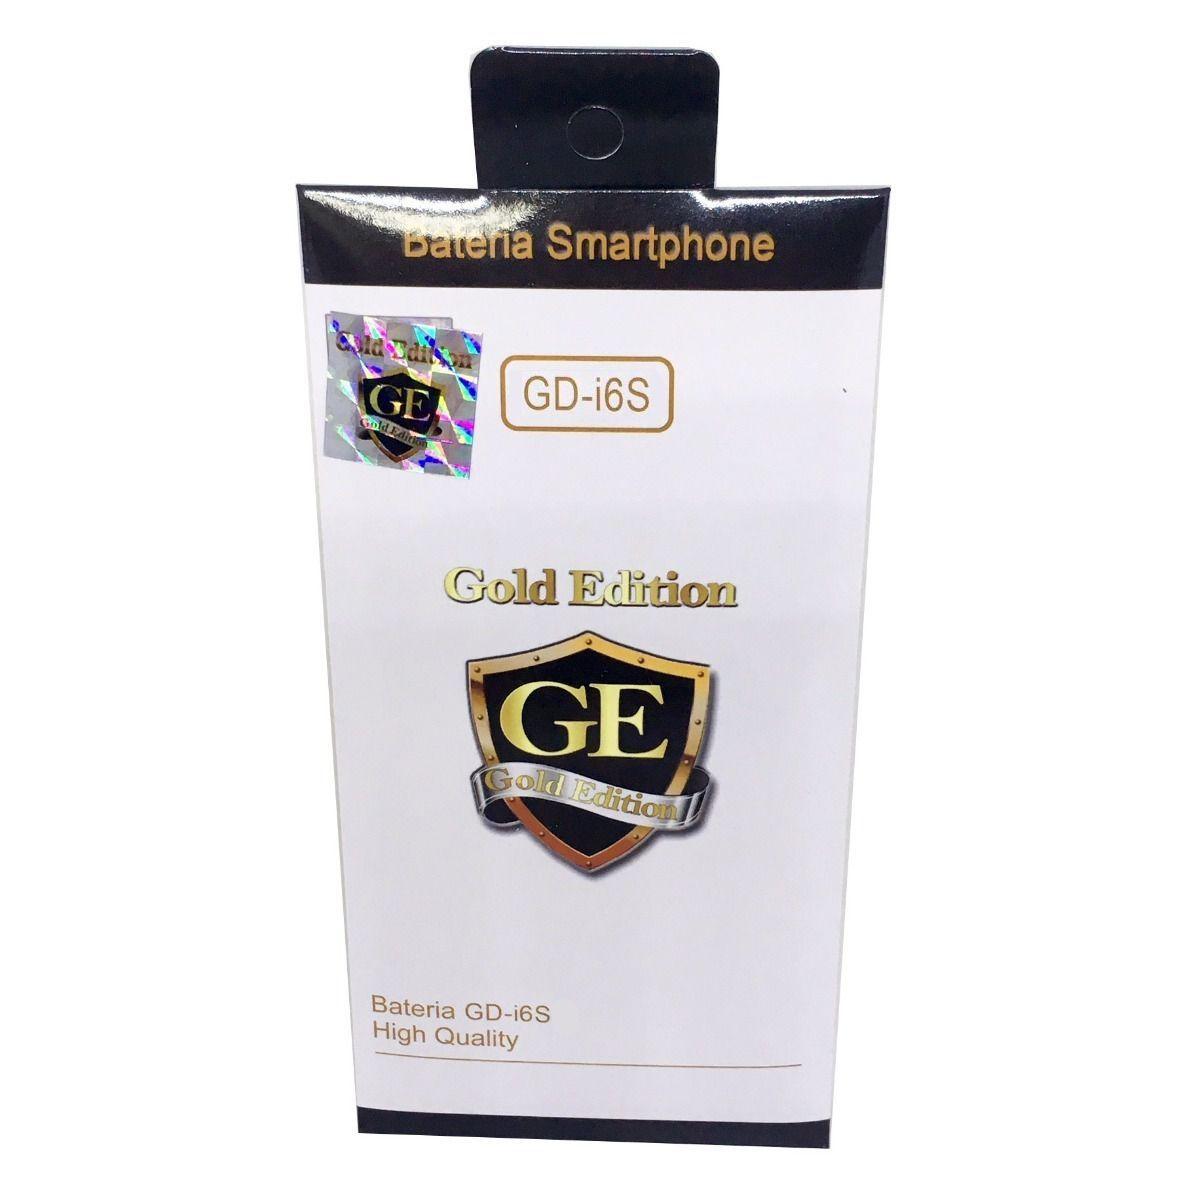 Bateria Para iPhone 6S Gold Edition GD-i6S